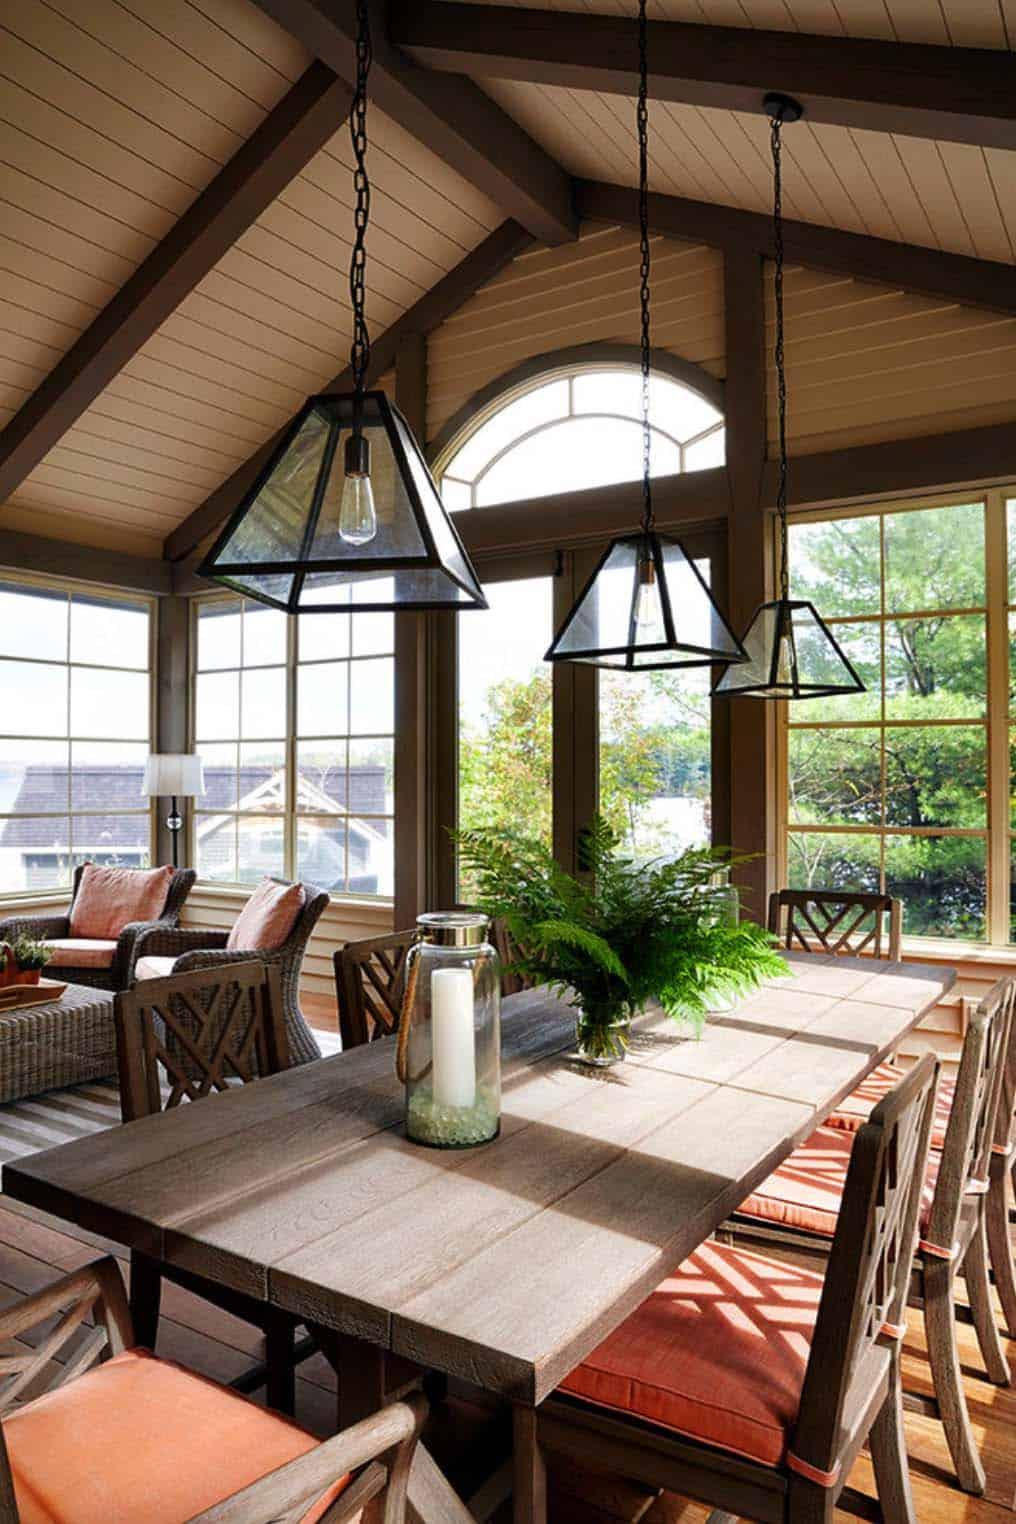 Muskoka Lake House-Anne Hepfer Designs-16-1 Kindesign